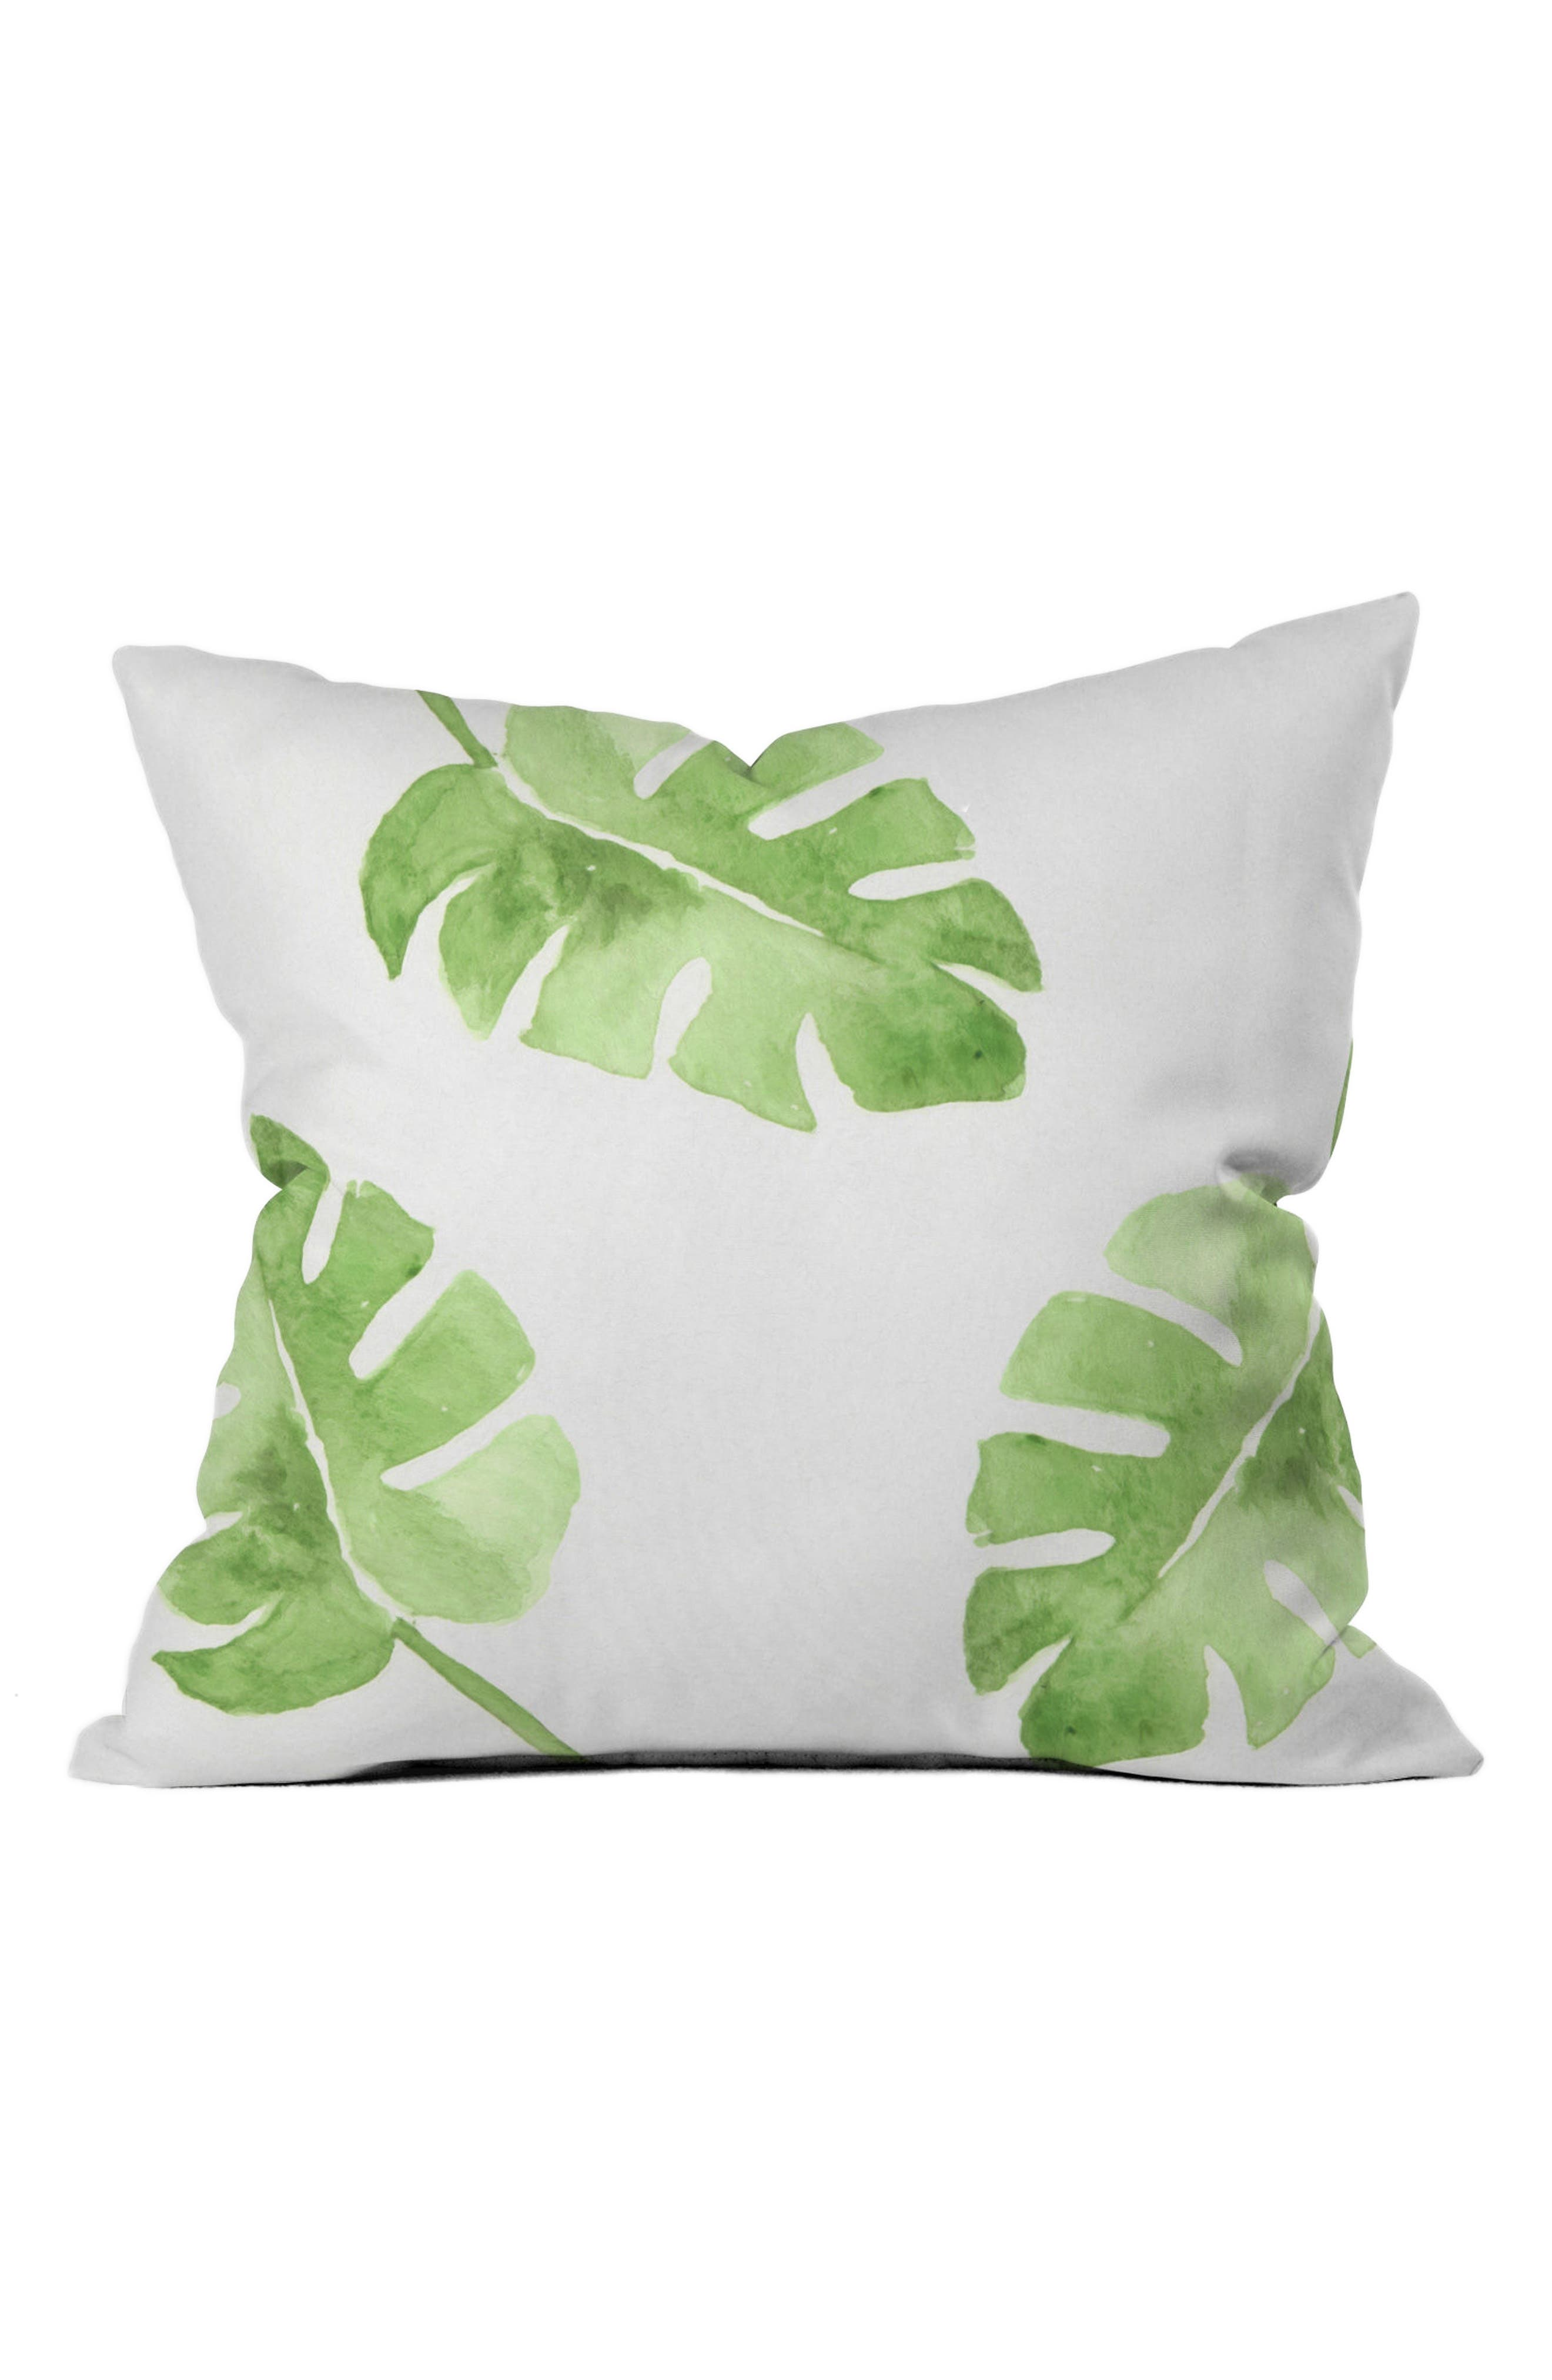 Alternate Image 1 Selected - DENY Designs Wonder Forest Pillow